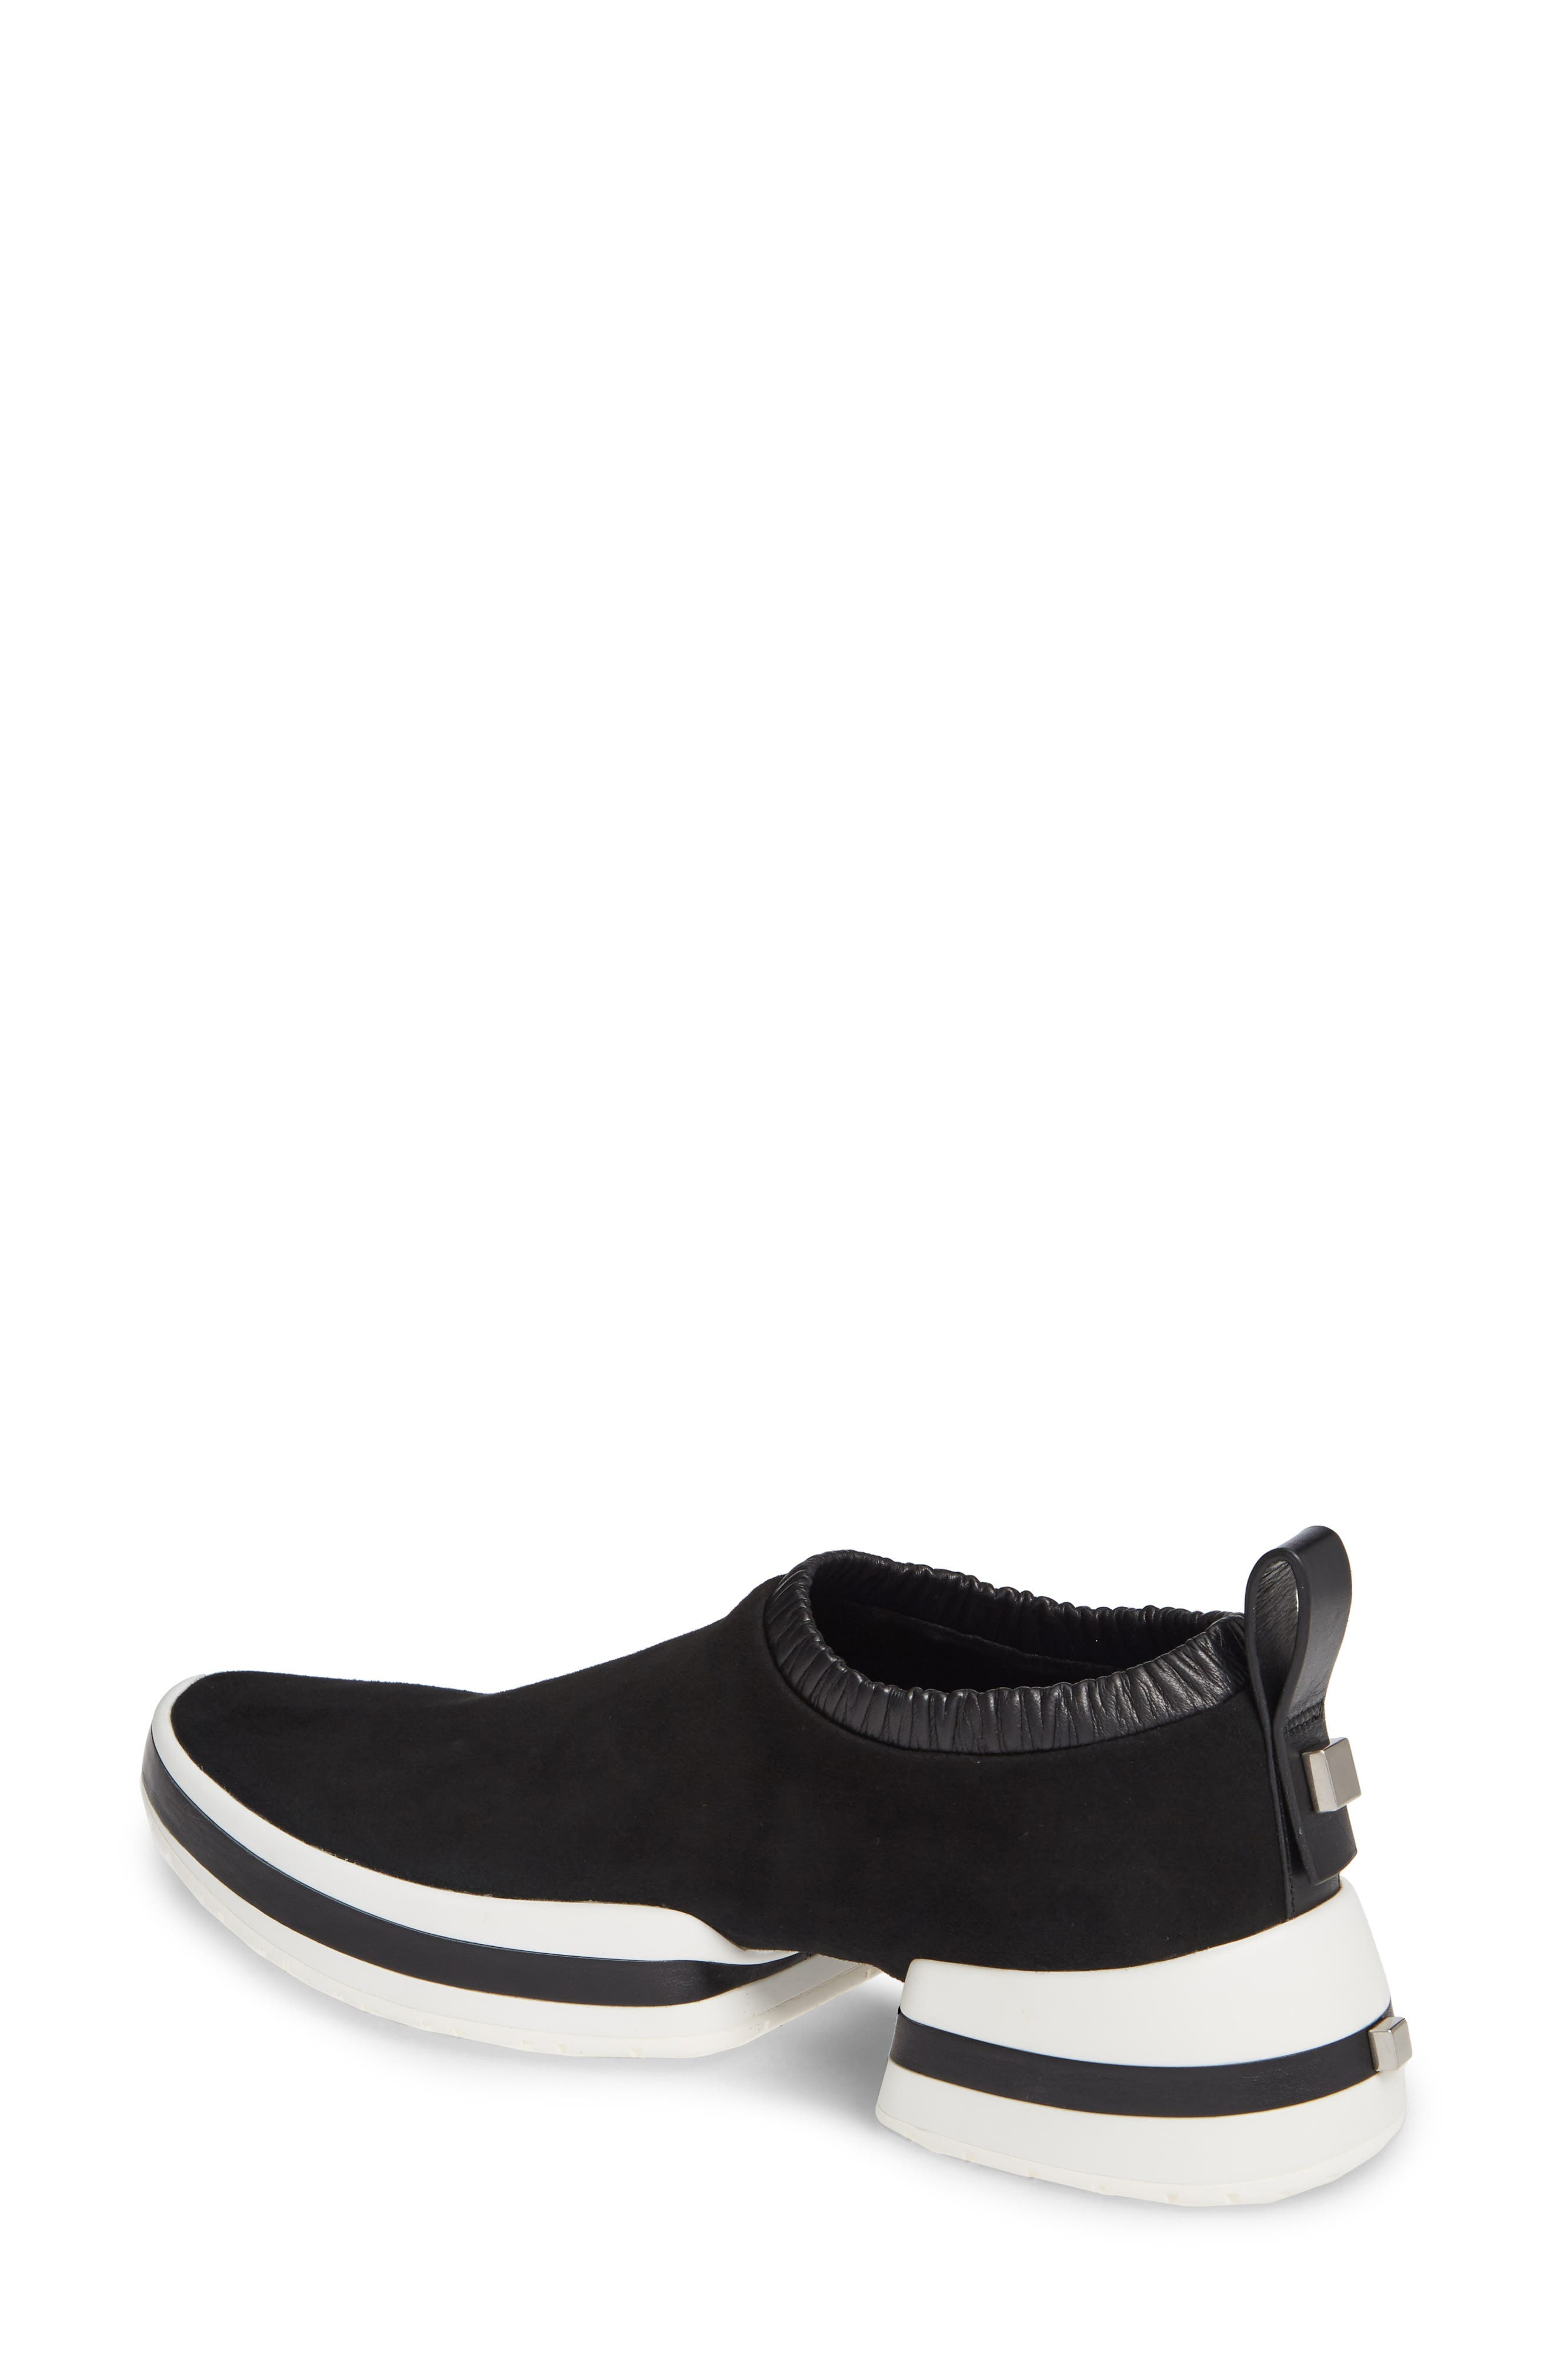 612 Sneaker,                             Alternate thumbnail 2, color,                             BLACK SUEDE